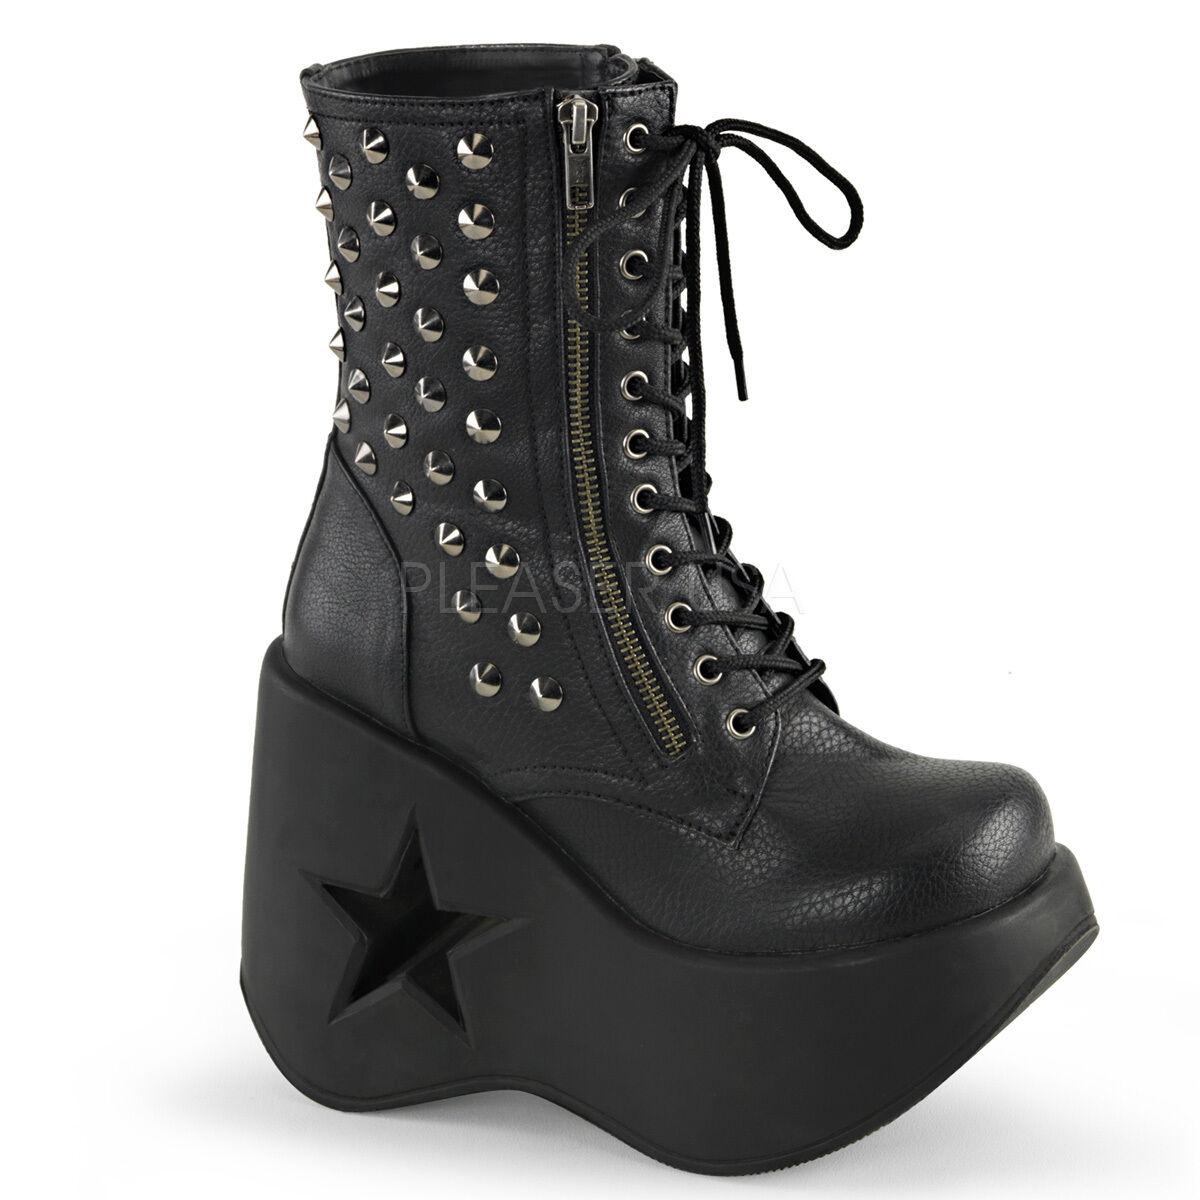 DEMONIA DYN100 BPU Women's Star Cutout Platform Punk Goth Studded Ankle Boots